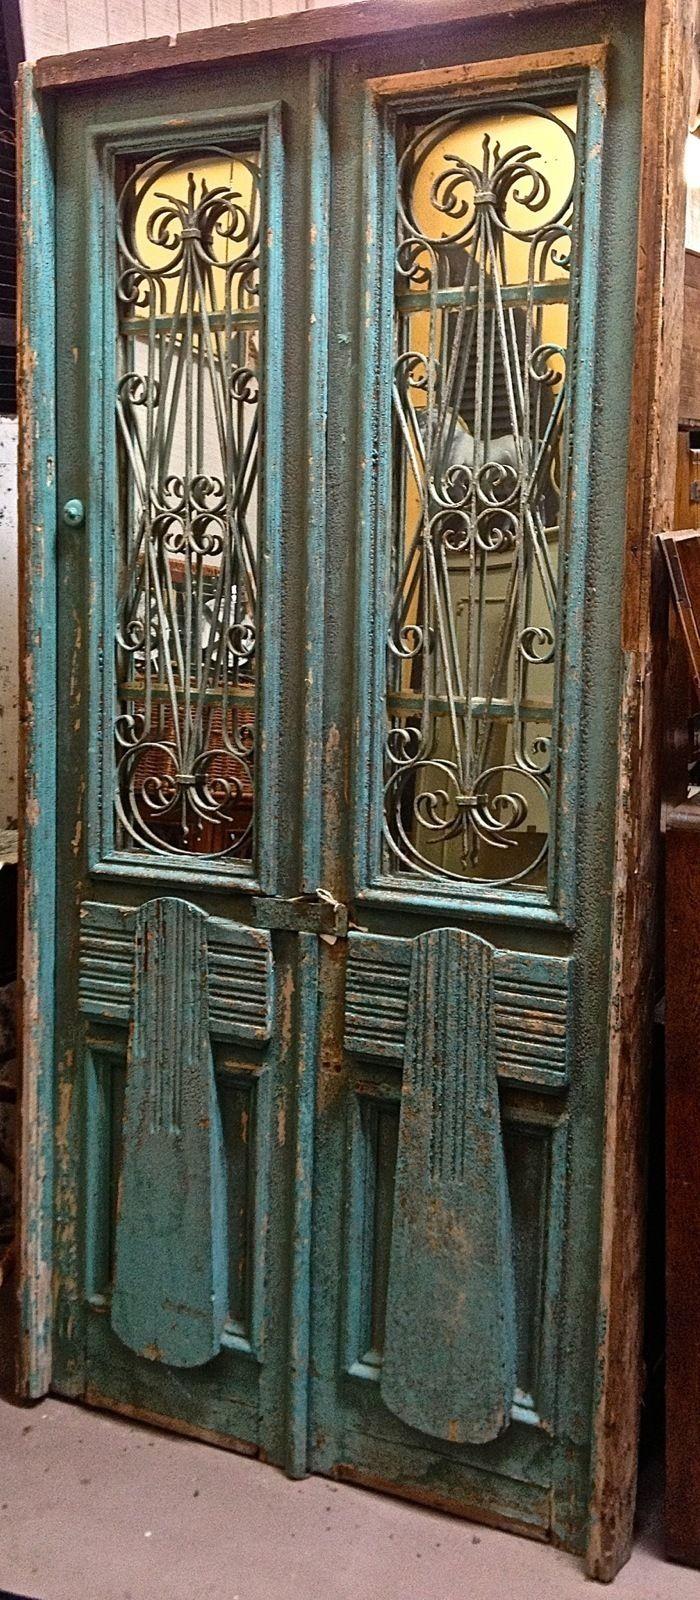 Vintage architectural salvage